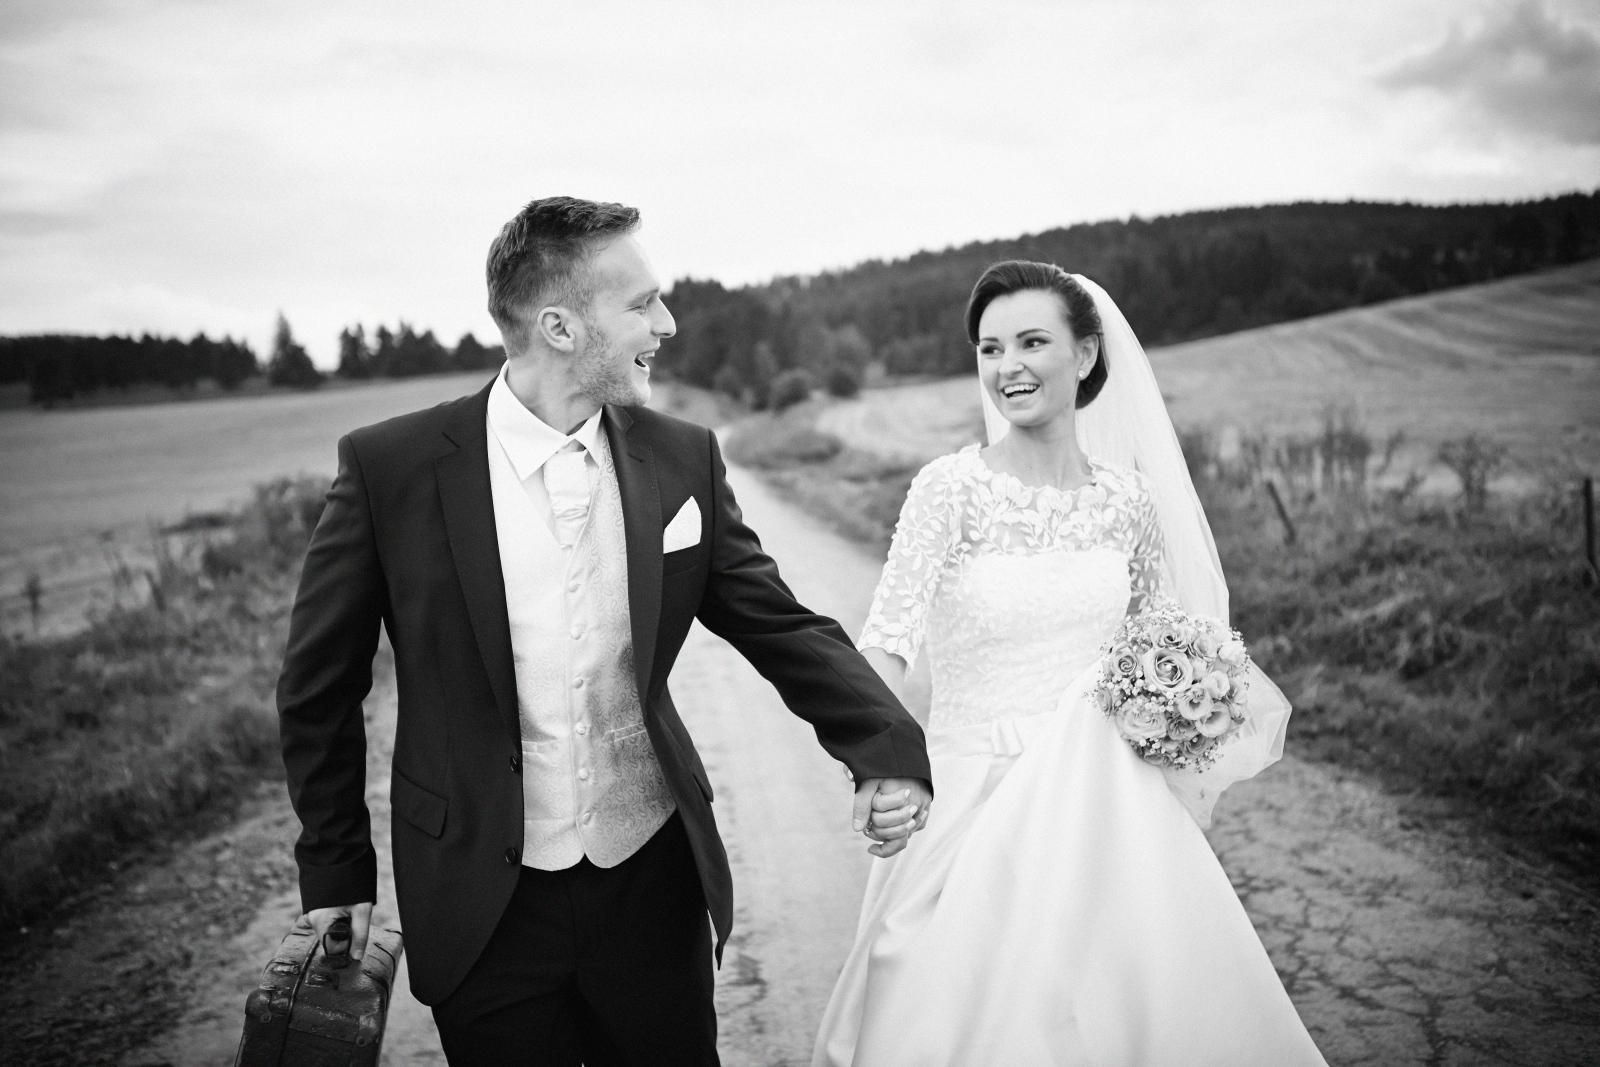 Svadba M+M - Obrázok č. 10